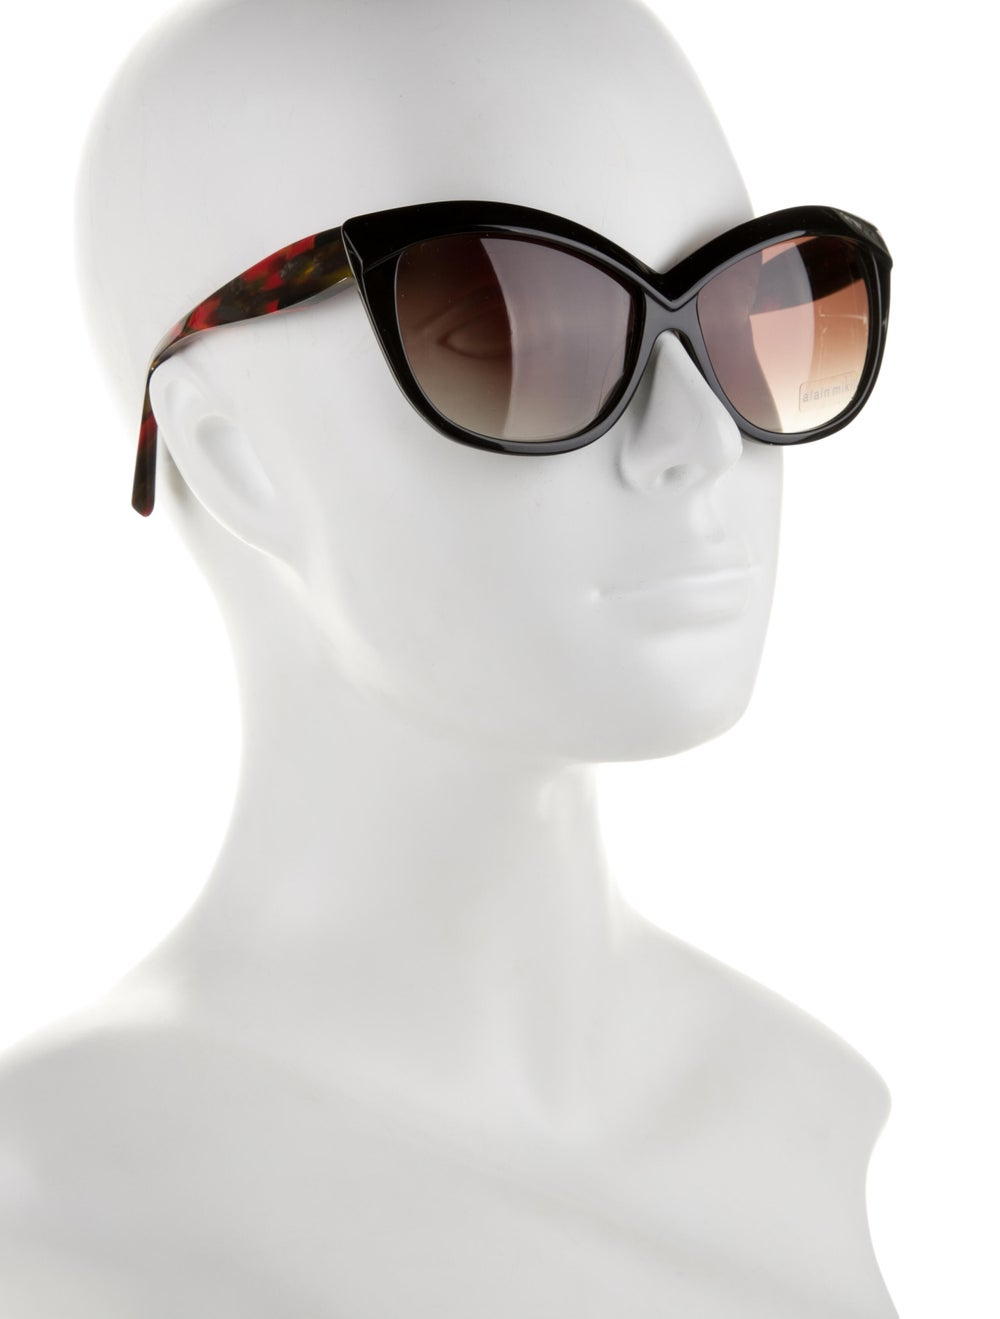 Alain Mikli Cat-Eye Tinted Sunglasses Black - image 4